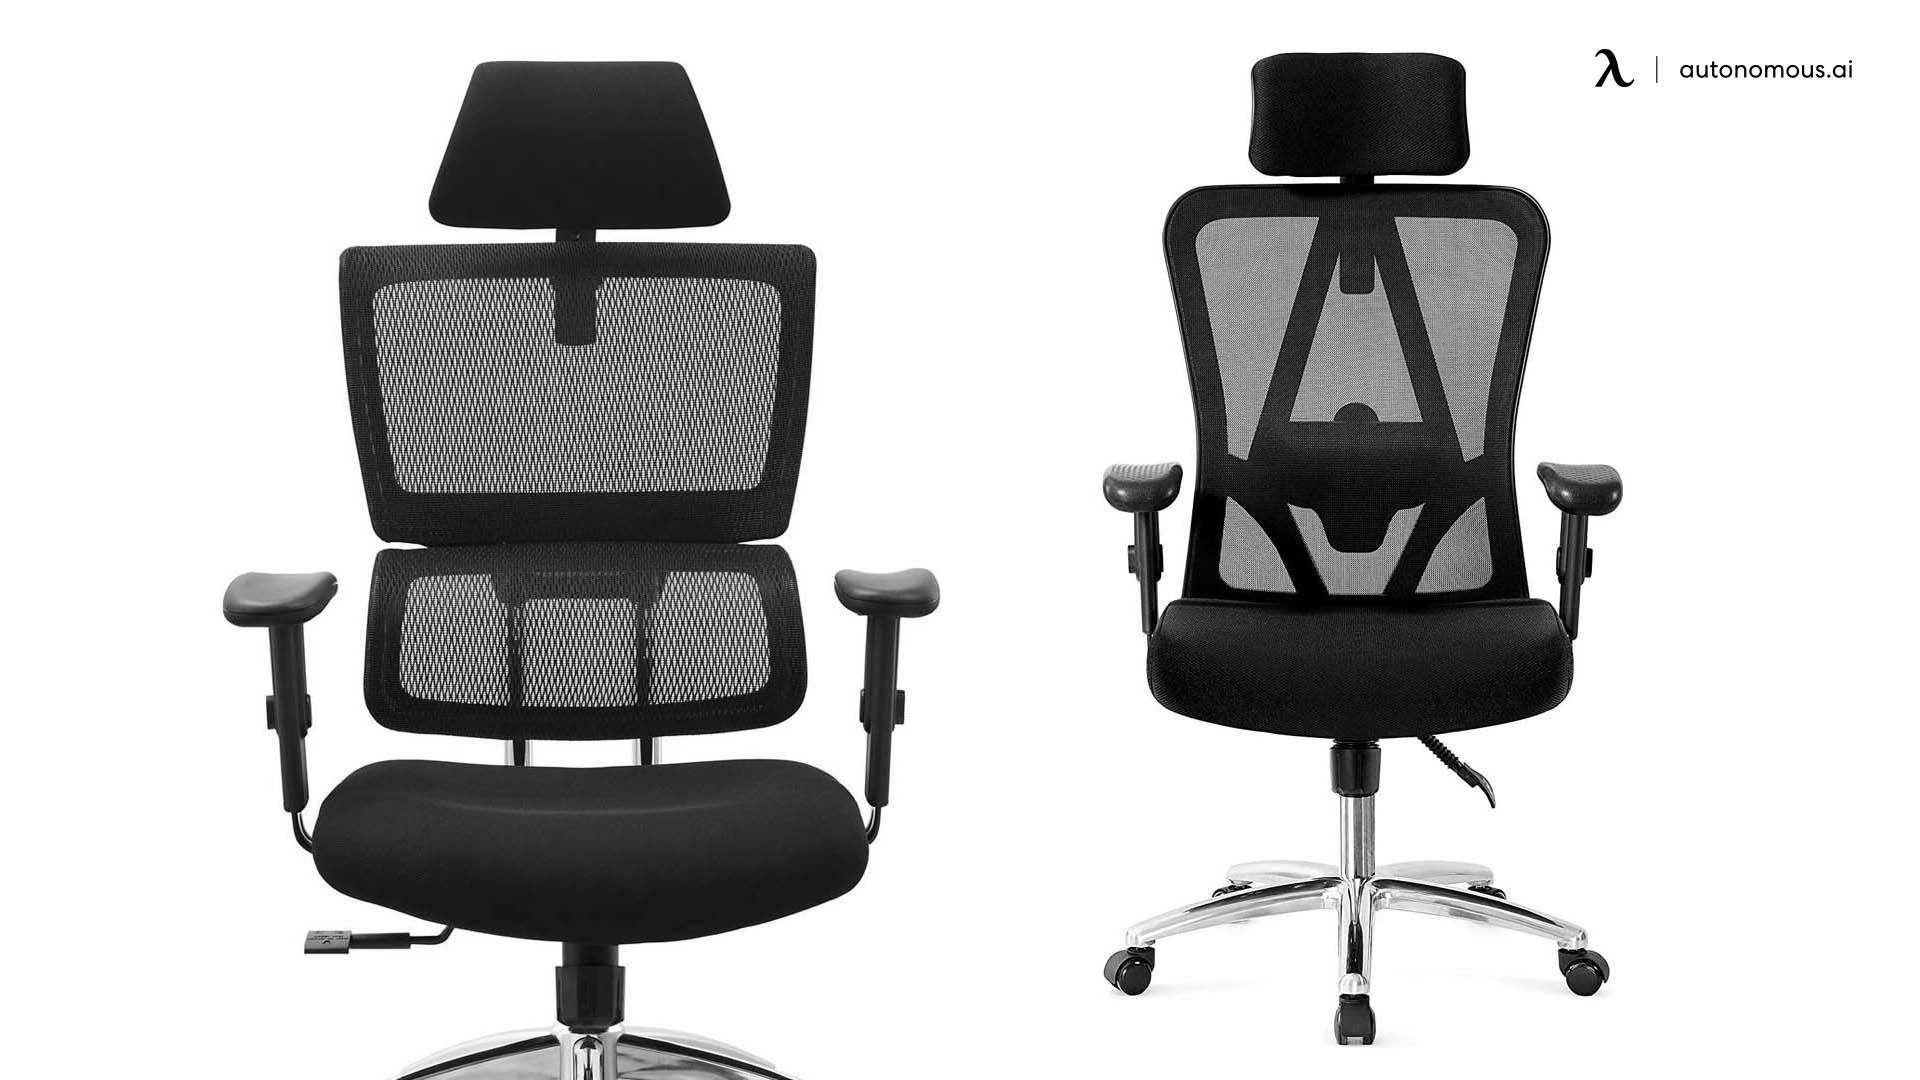 Tivoca Ergonomic Office Chair